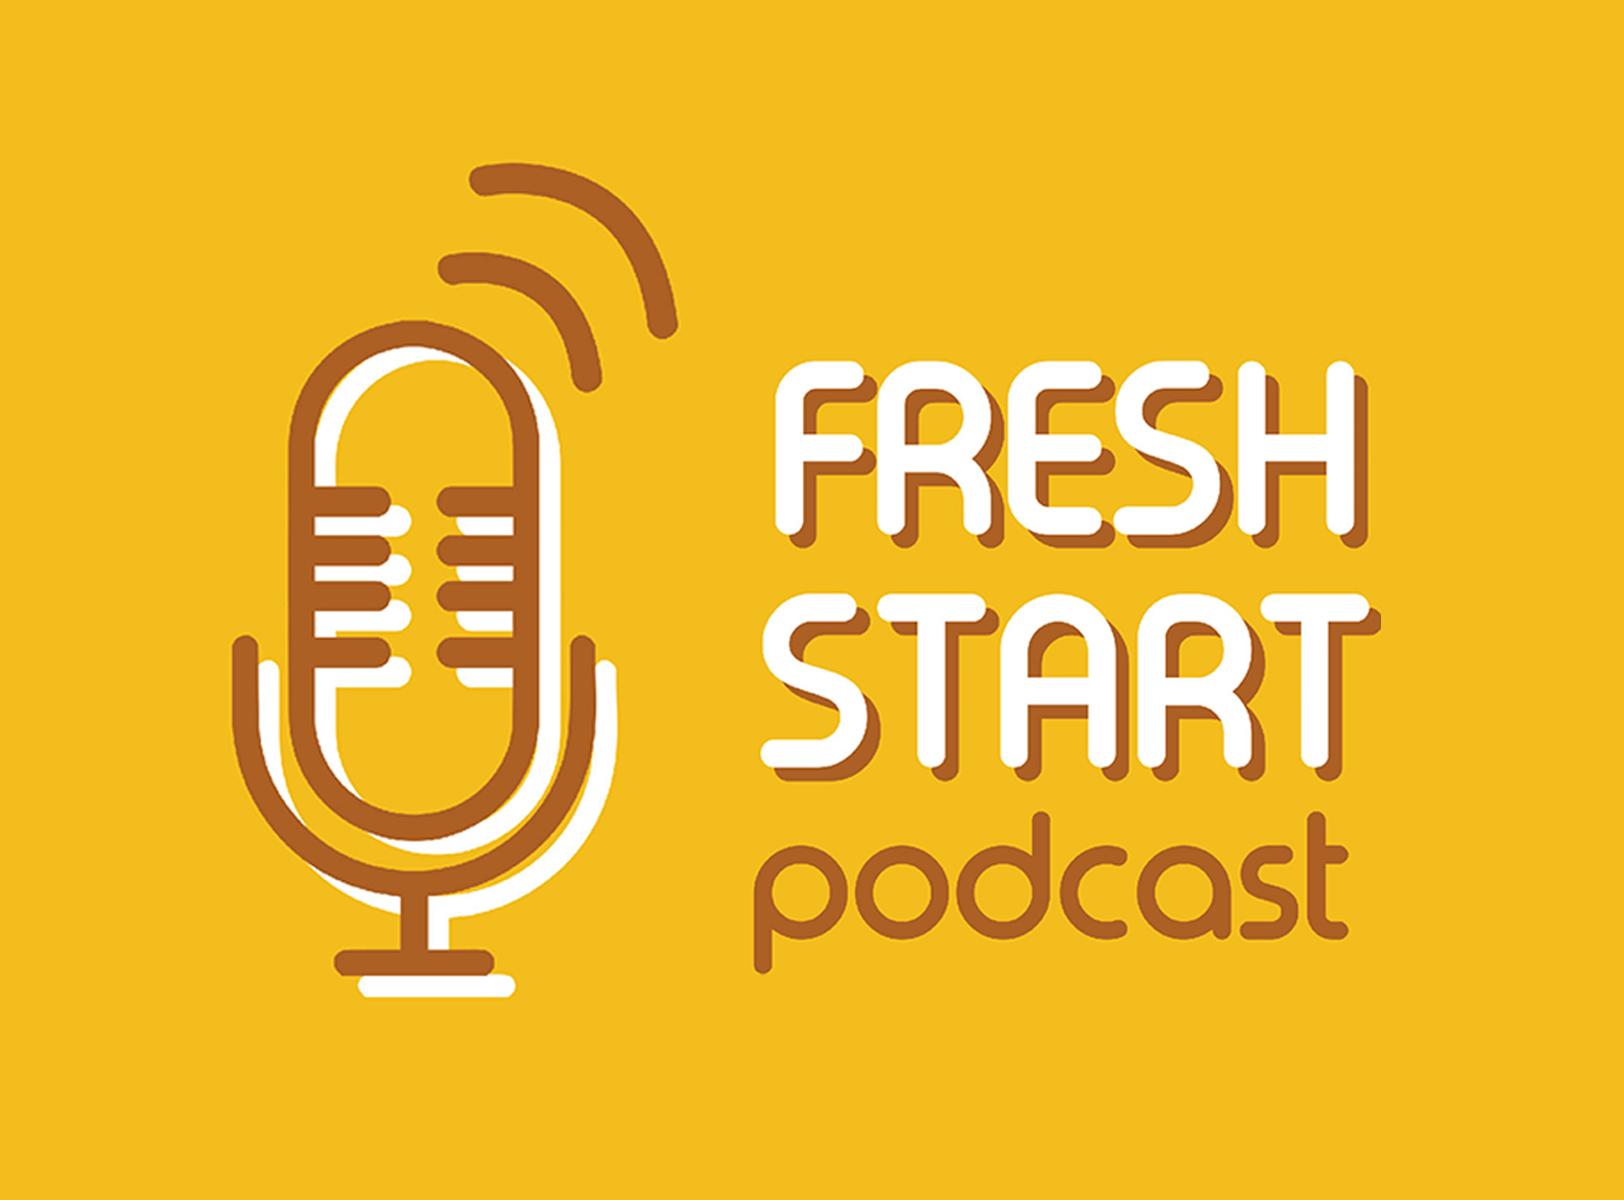 Fresh Start: Podcast News (4/3/2019 Wed.)